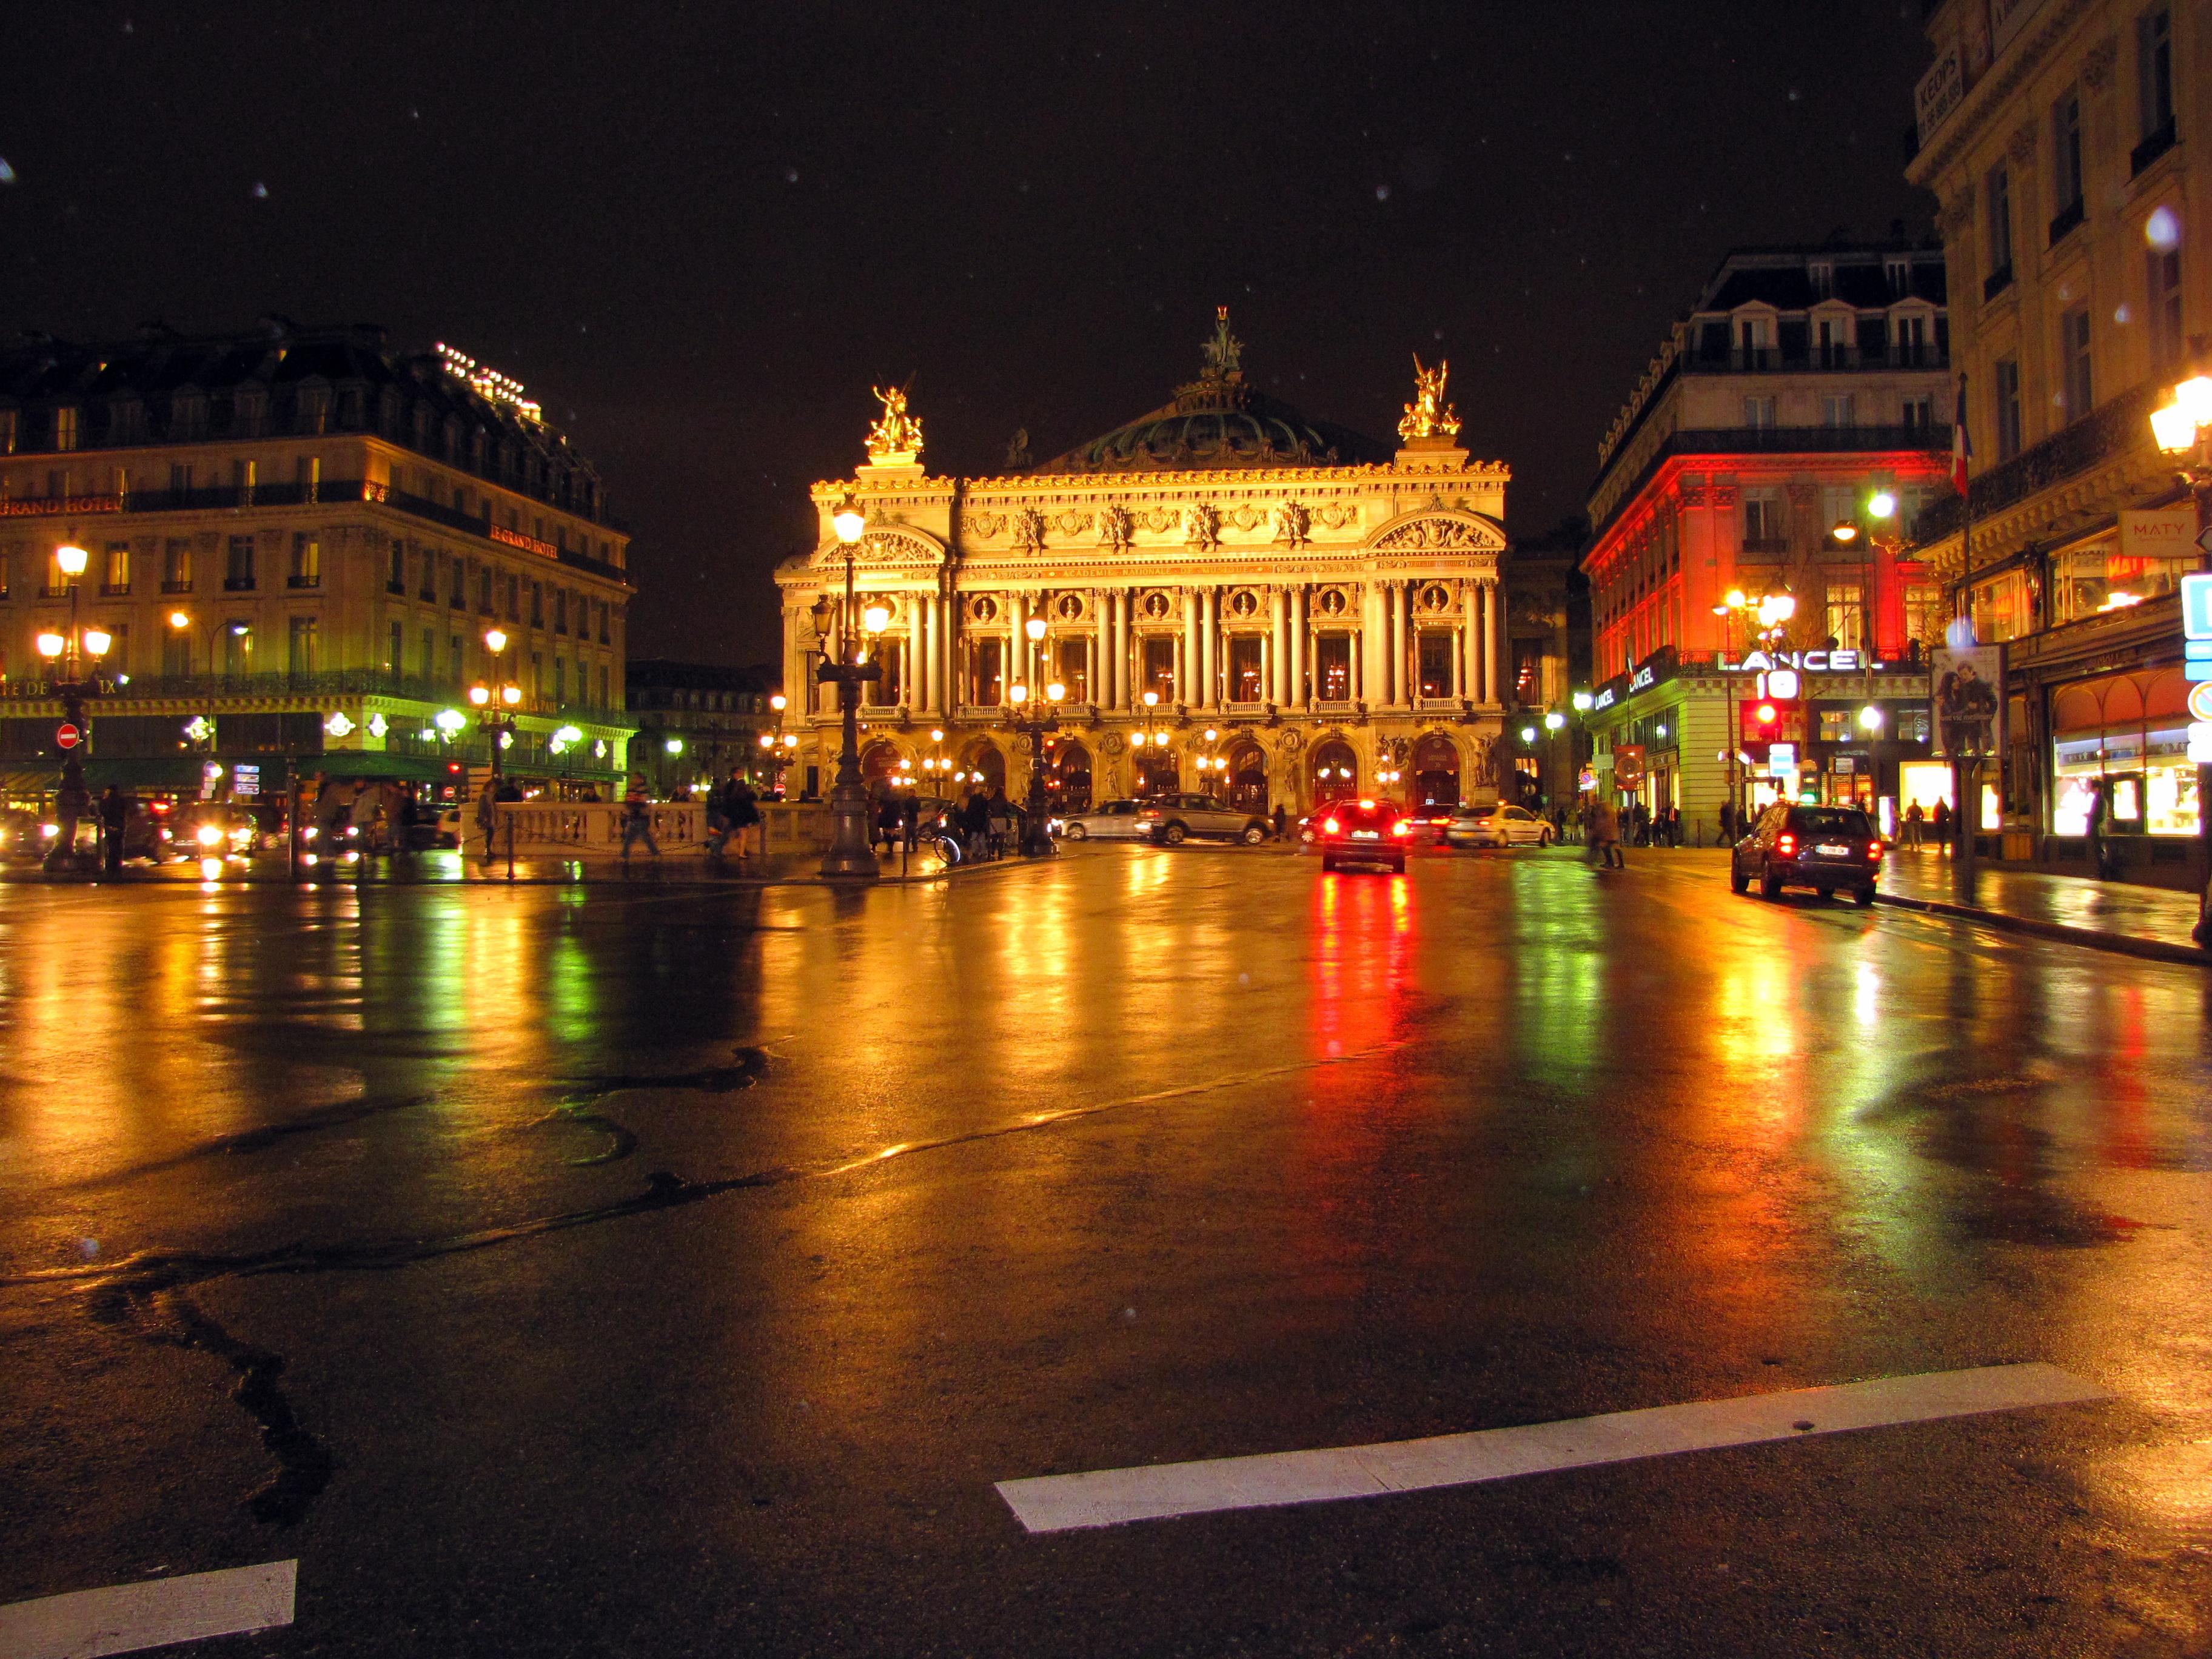 Опера Гарнье ночью. Источник https://upload.wikimedia.org/